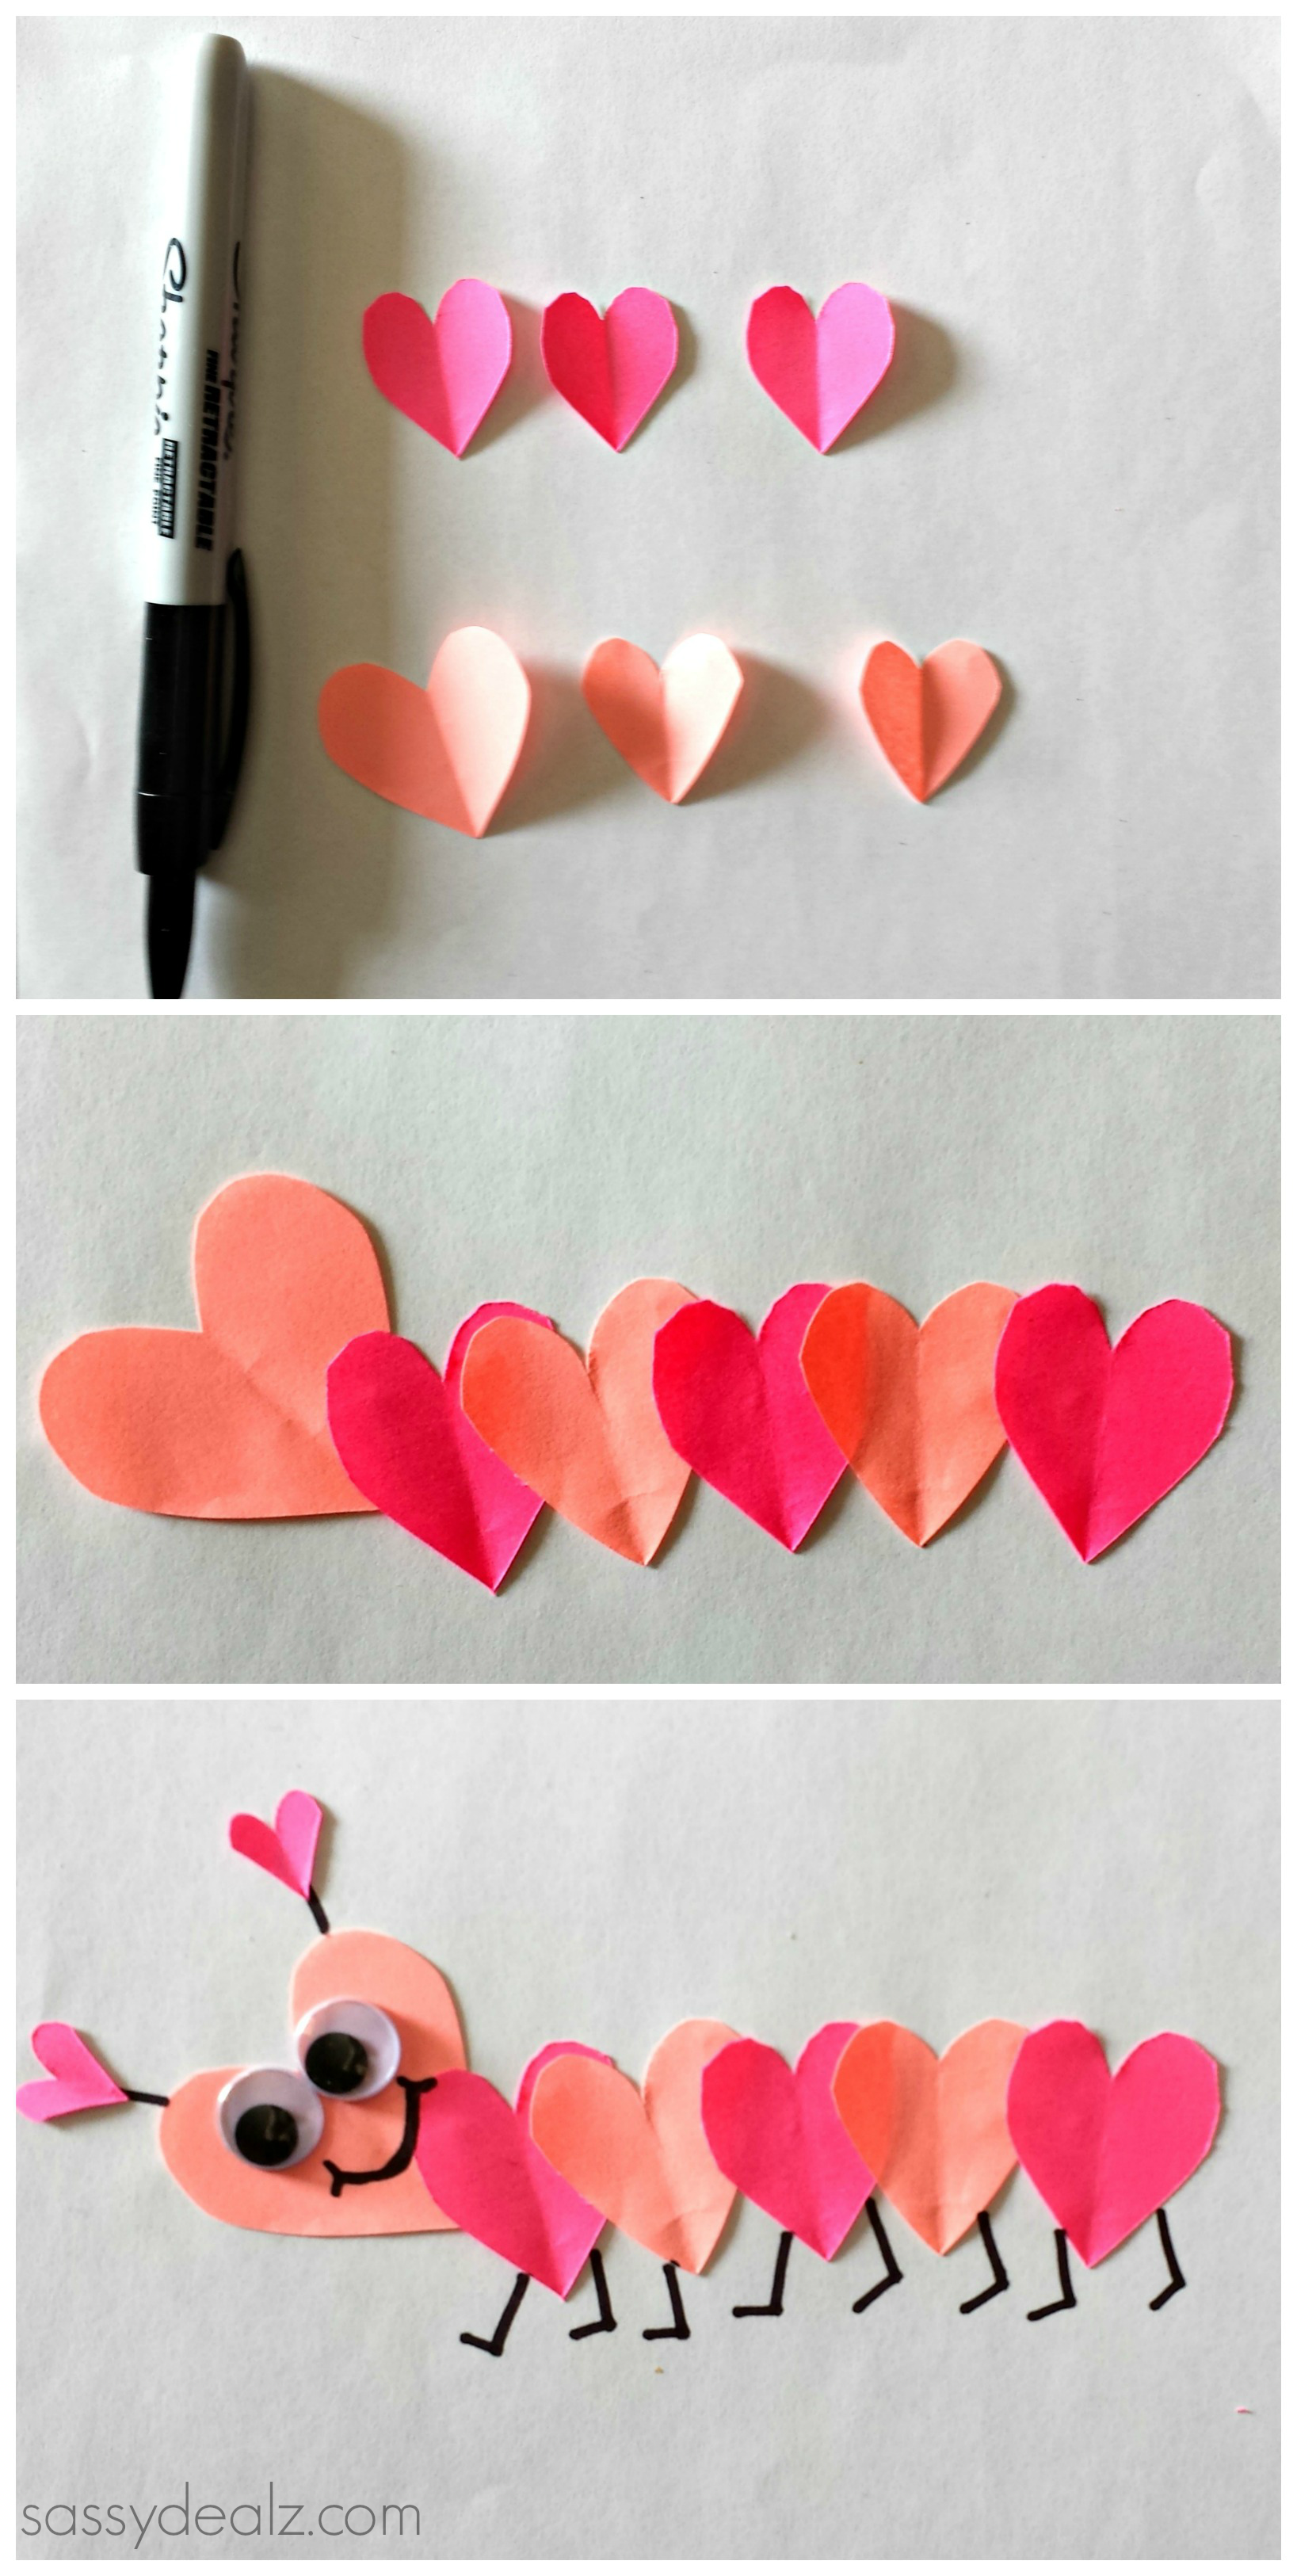 Valentine's Day Heart Caterpillar Craft For Kids - Crafty Morning